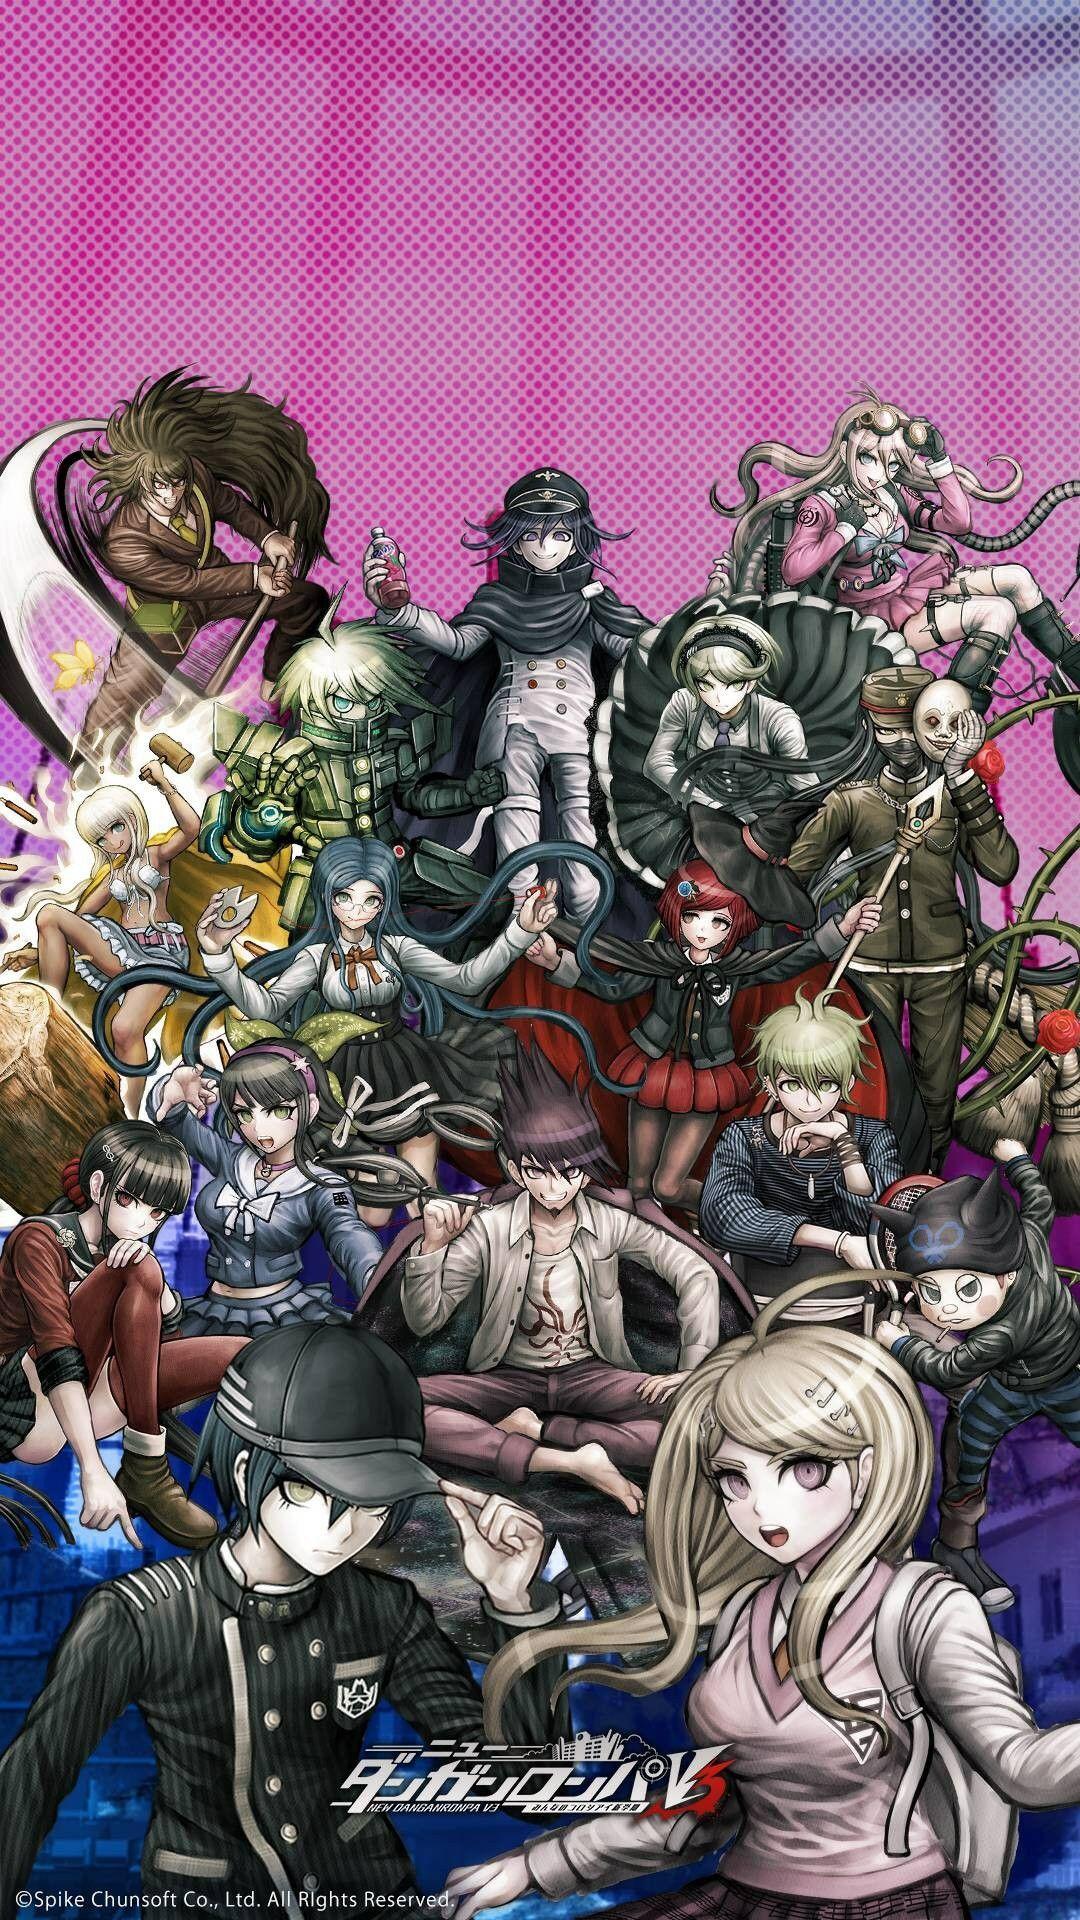 Pin By Saiko Youtube On Etc Anime Wallpaper Danganronpa Anime Background